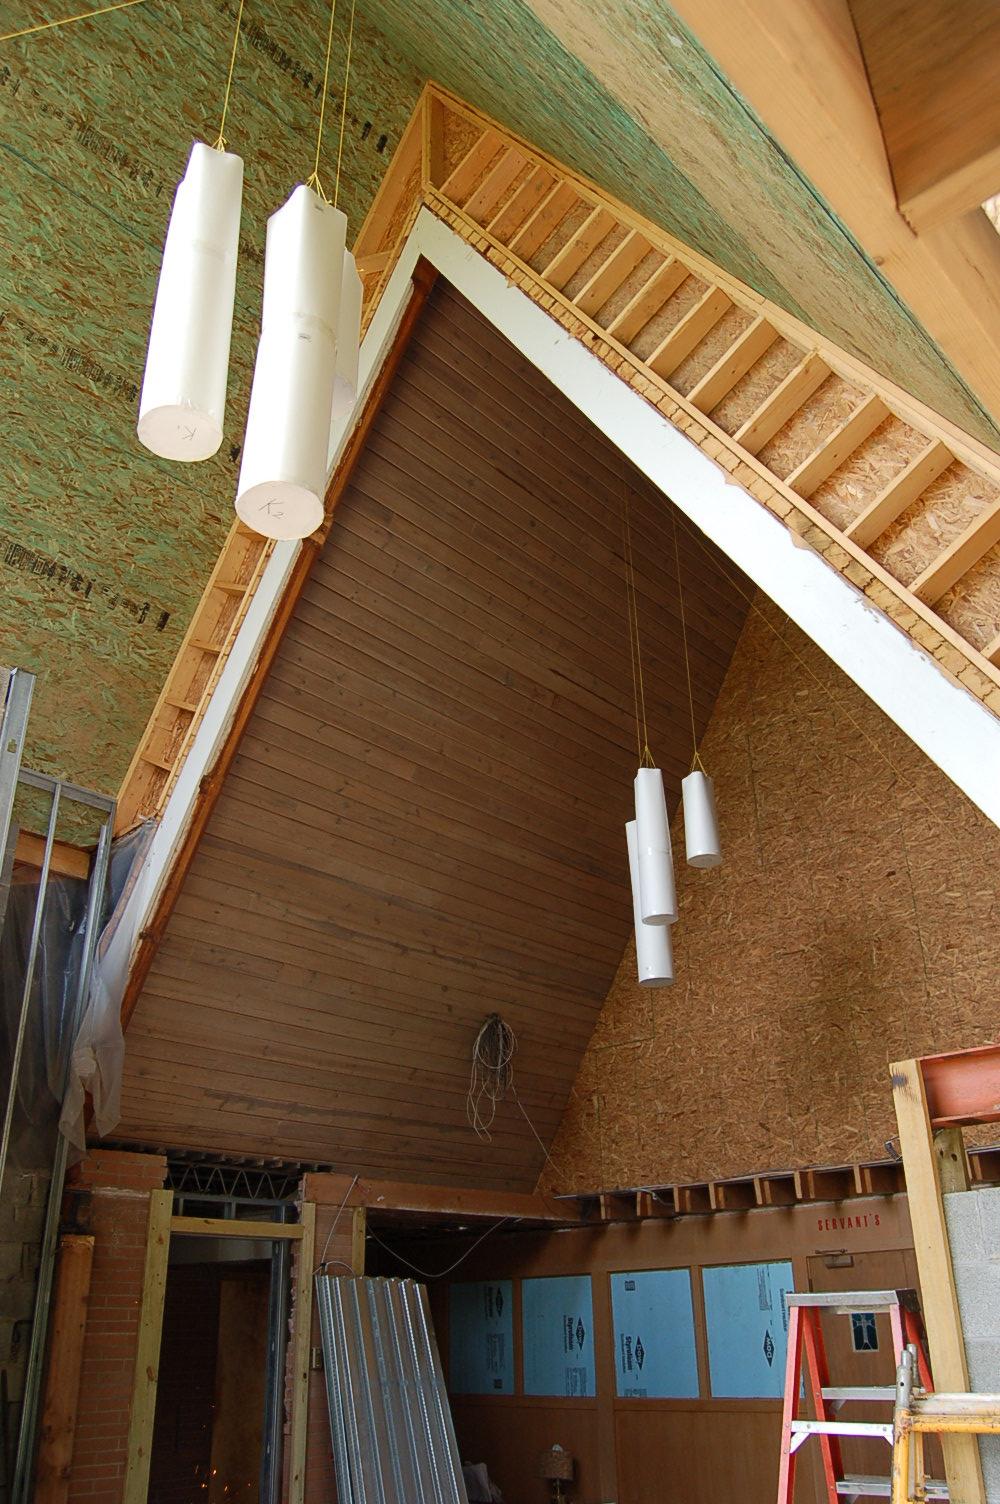 North Sewickley Presbyterian Church Narthex Inside Lights 061515